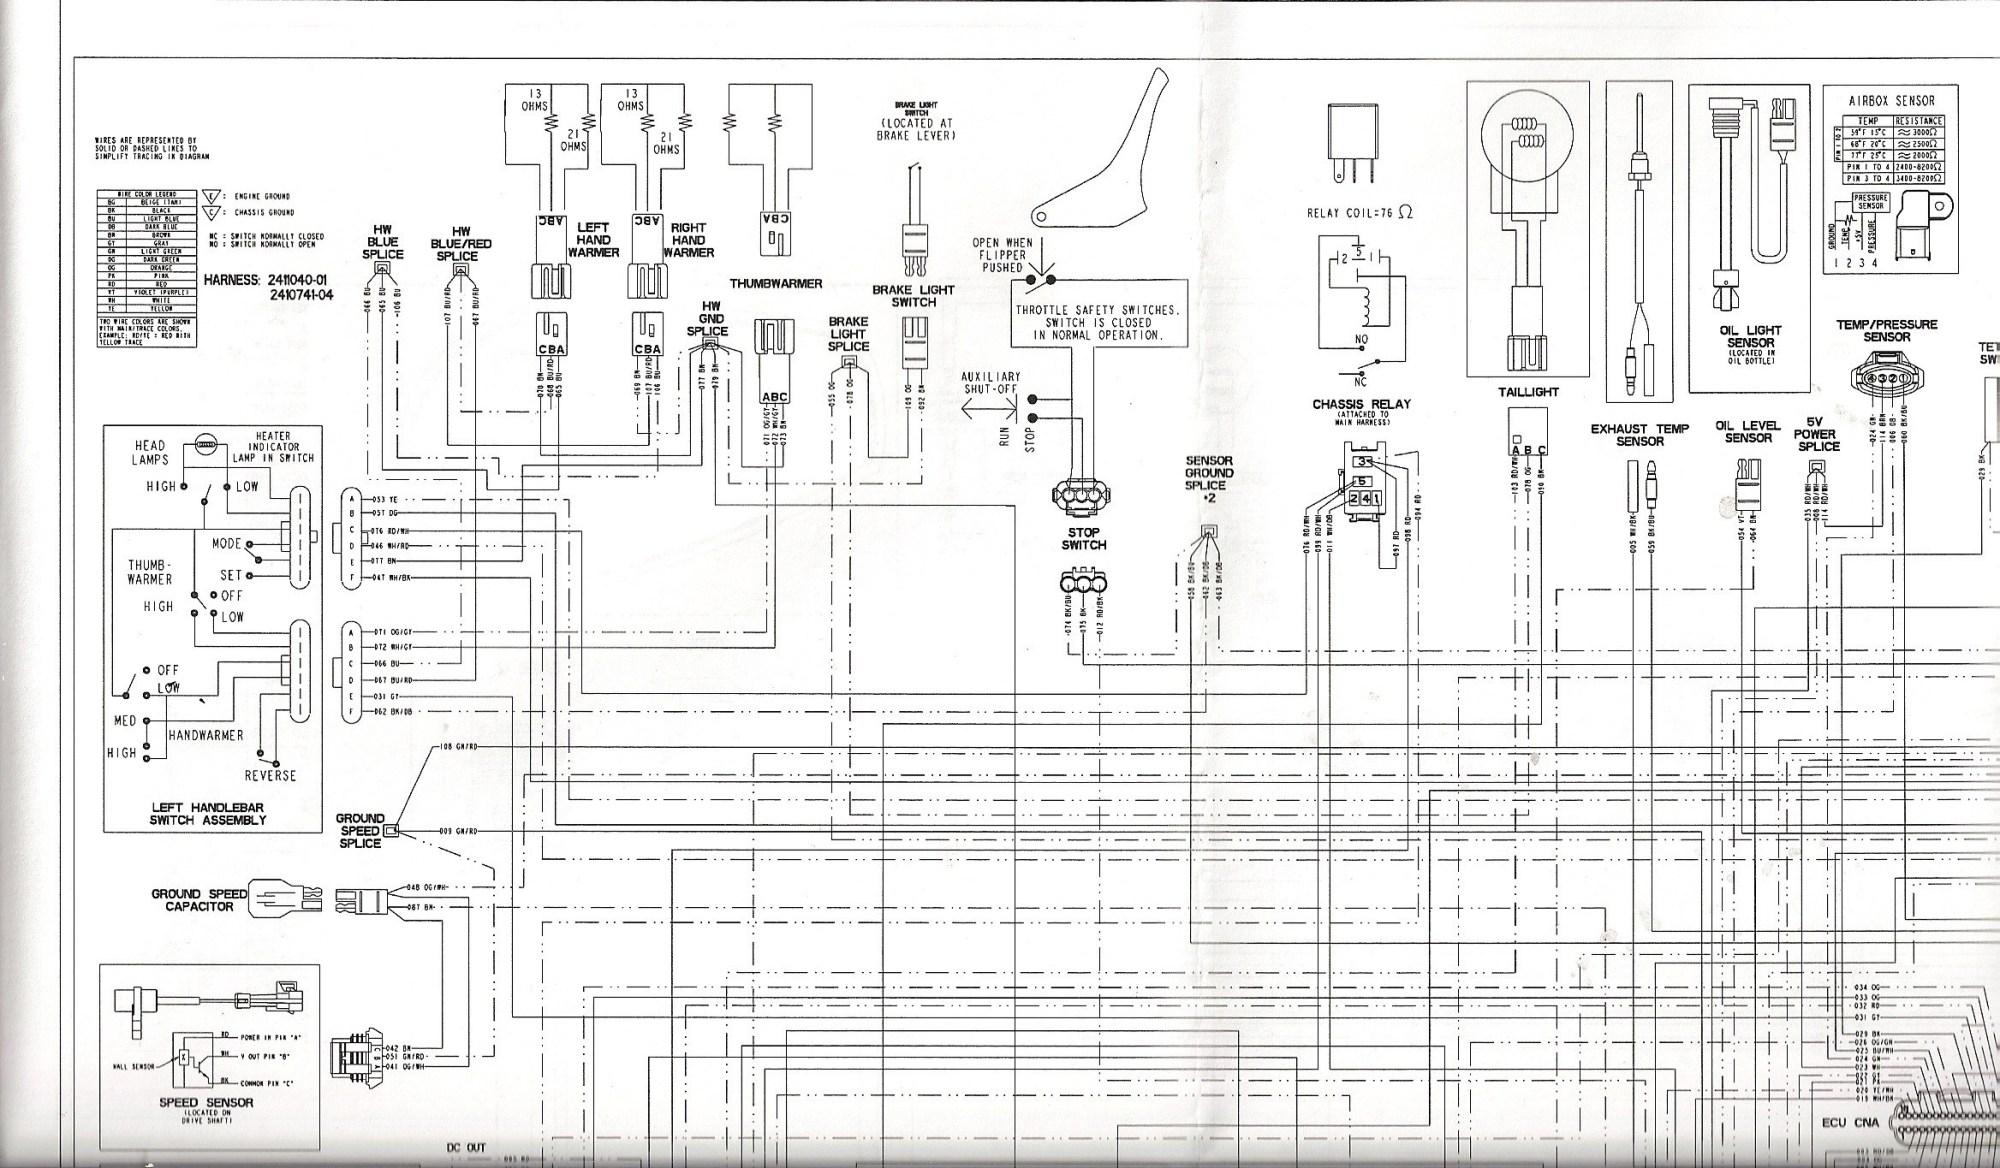 hight resolution of wiring schematic for 2006 polaris 700 atv wiring diagram structure 2006 polaris ranger 700 wiring diagram